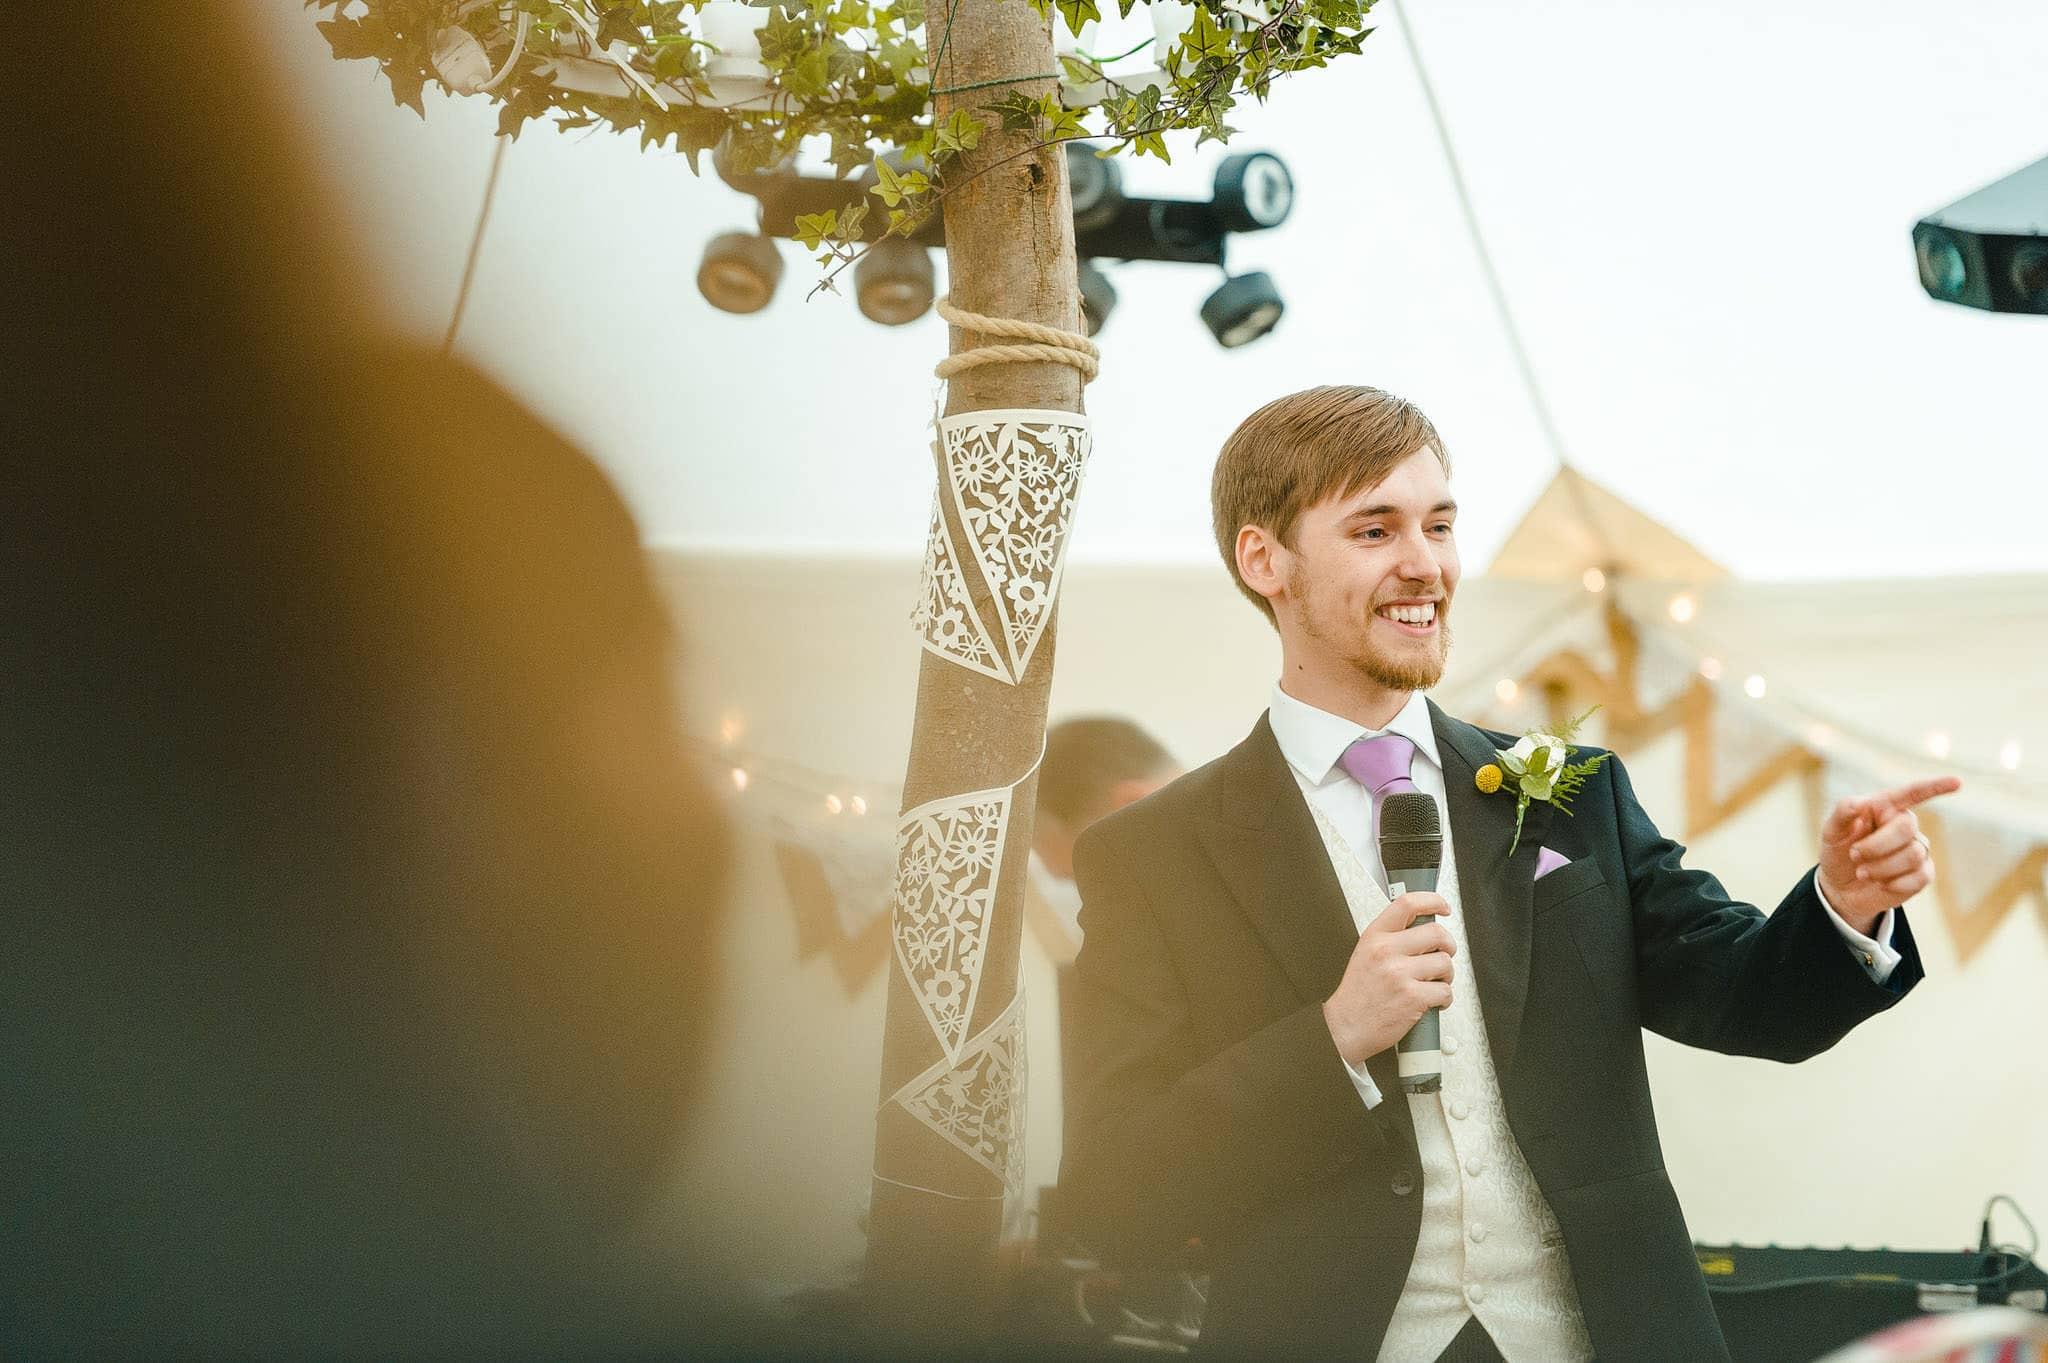 wedding photography midlands 62 - Midlands wedding photography - 2015 Review